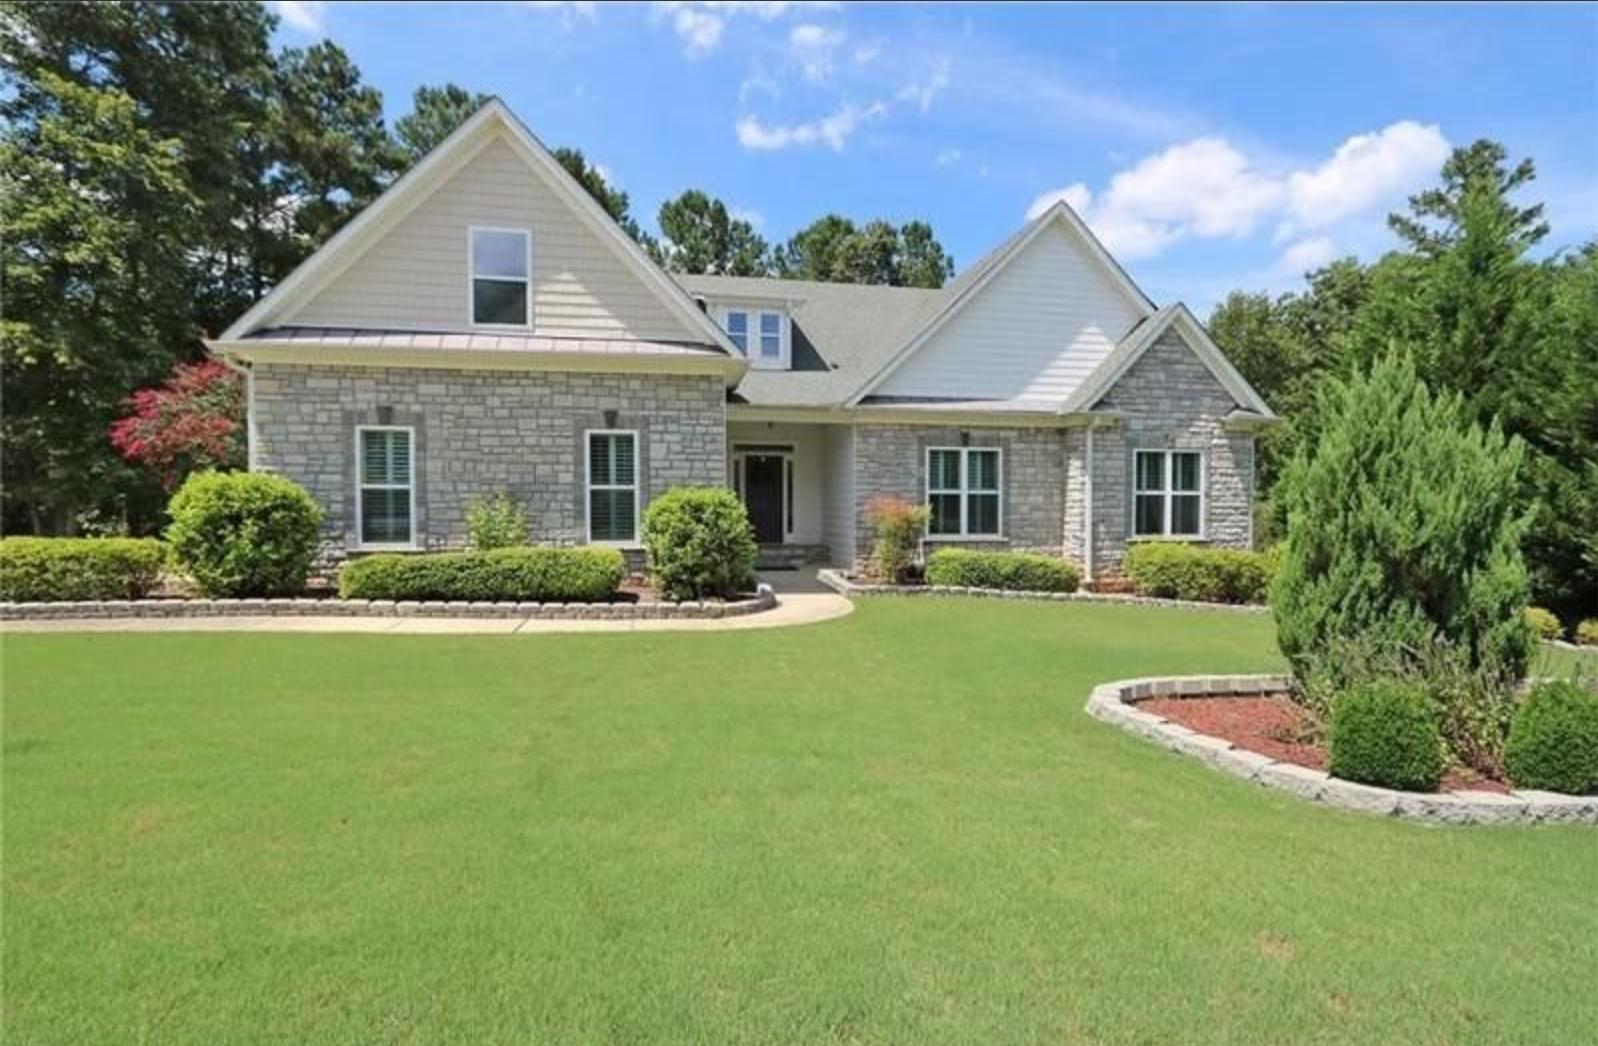 Dallas, Georgia (Atlanta-Sandy Springs-Roswell, GA); list price: $299,900; square footage: 2,932; beds/baths: 4/3.5